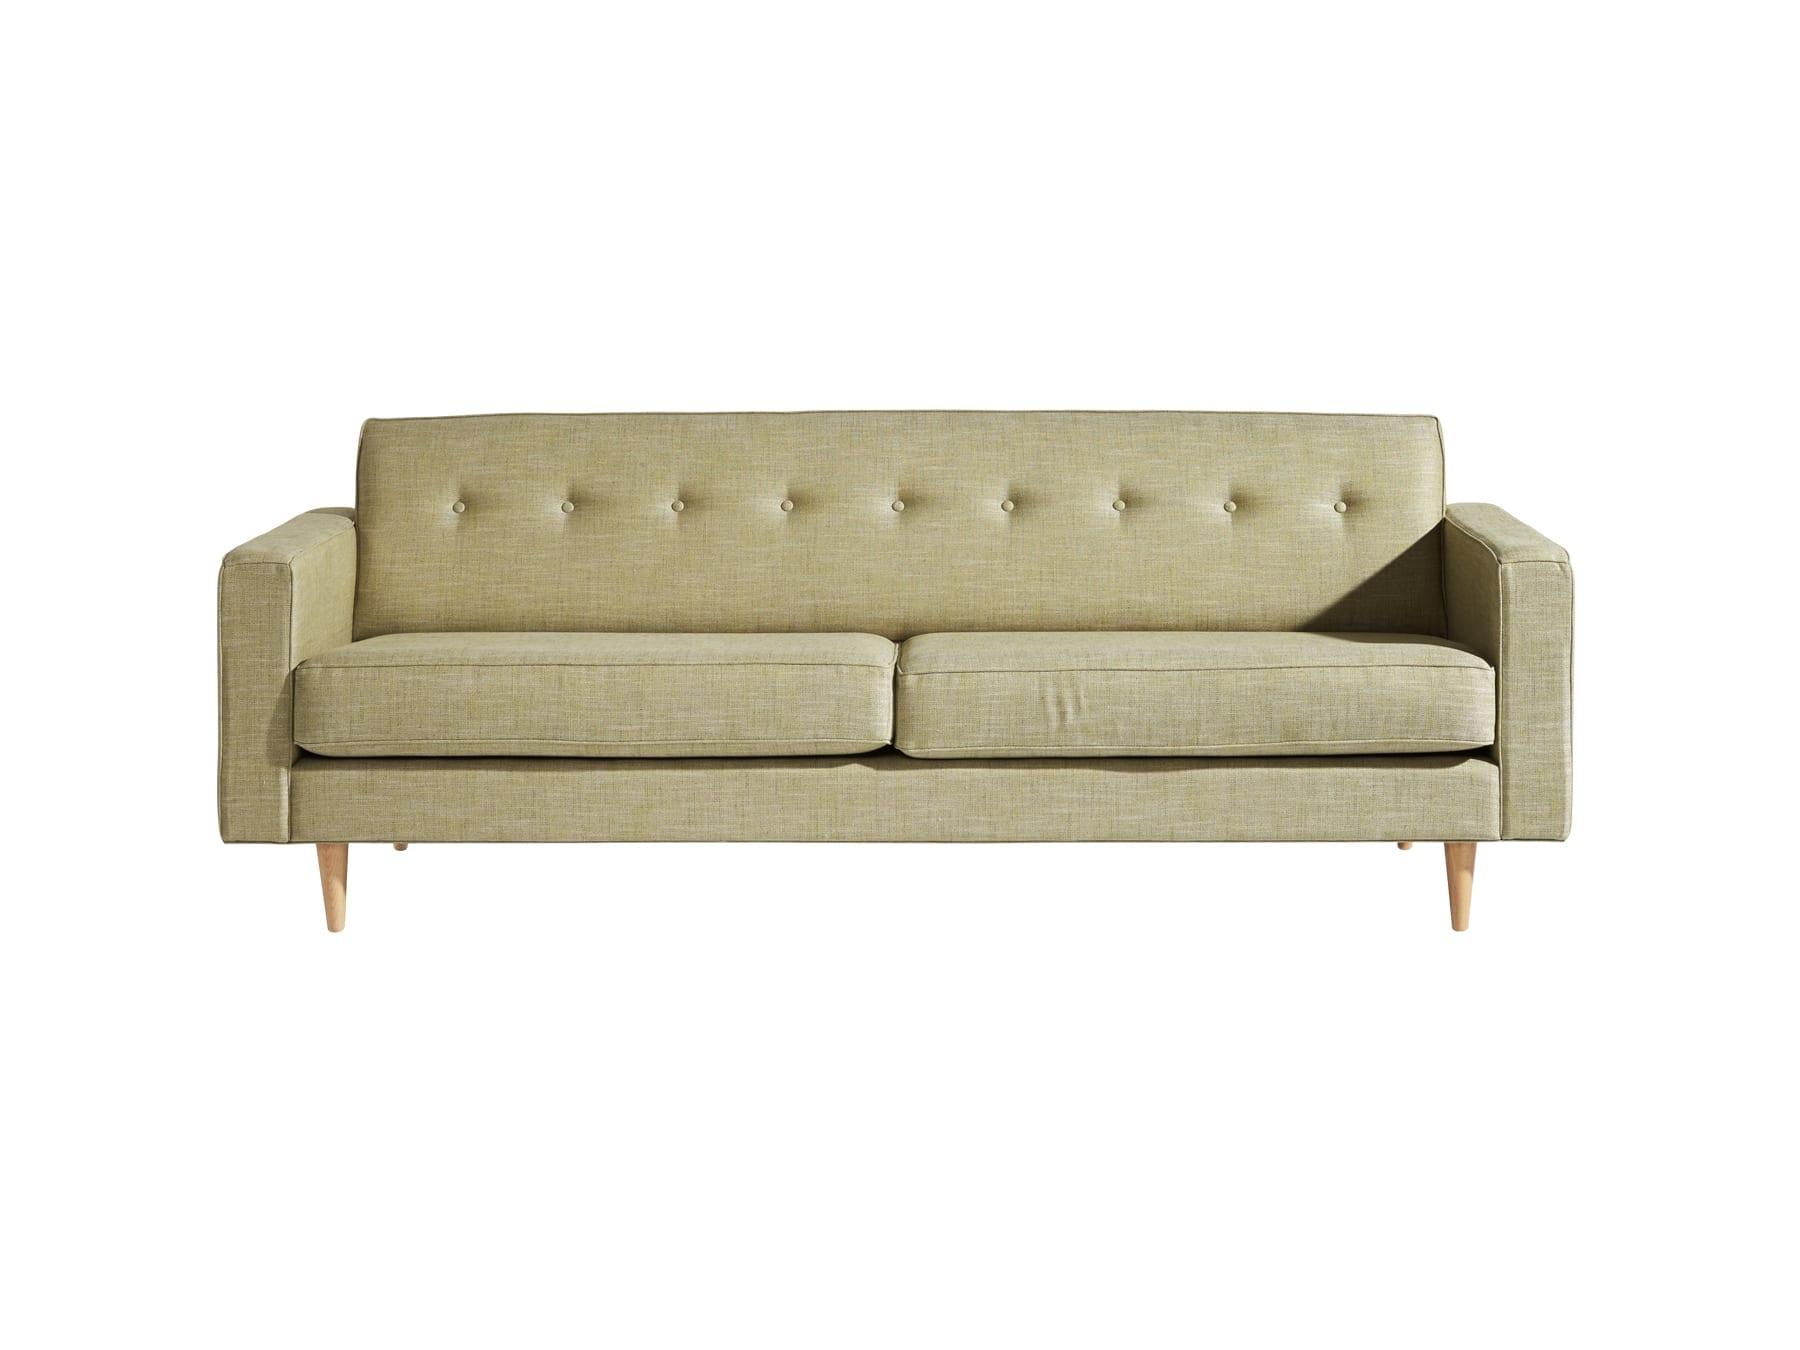 Finewood chester sofa mckenzie willis for Sofa chester oferta